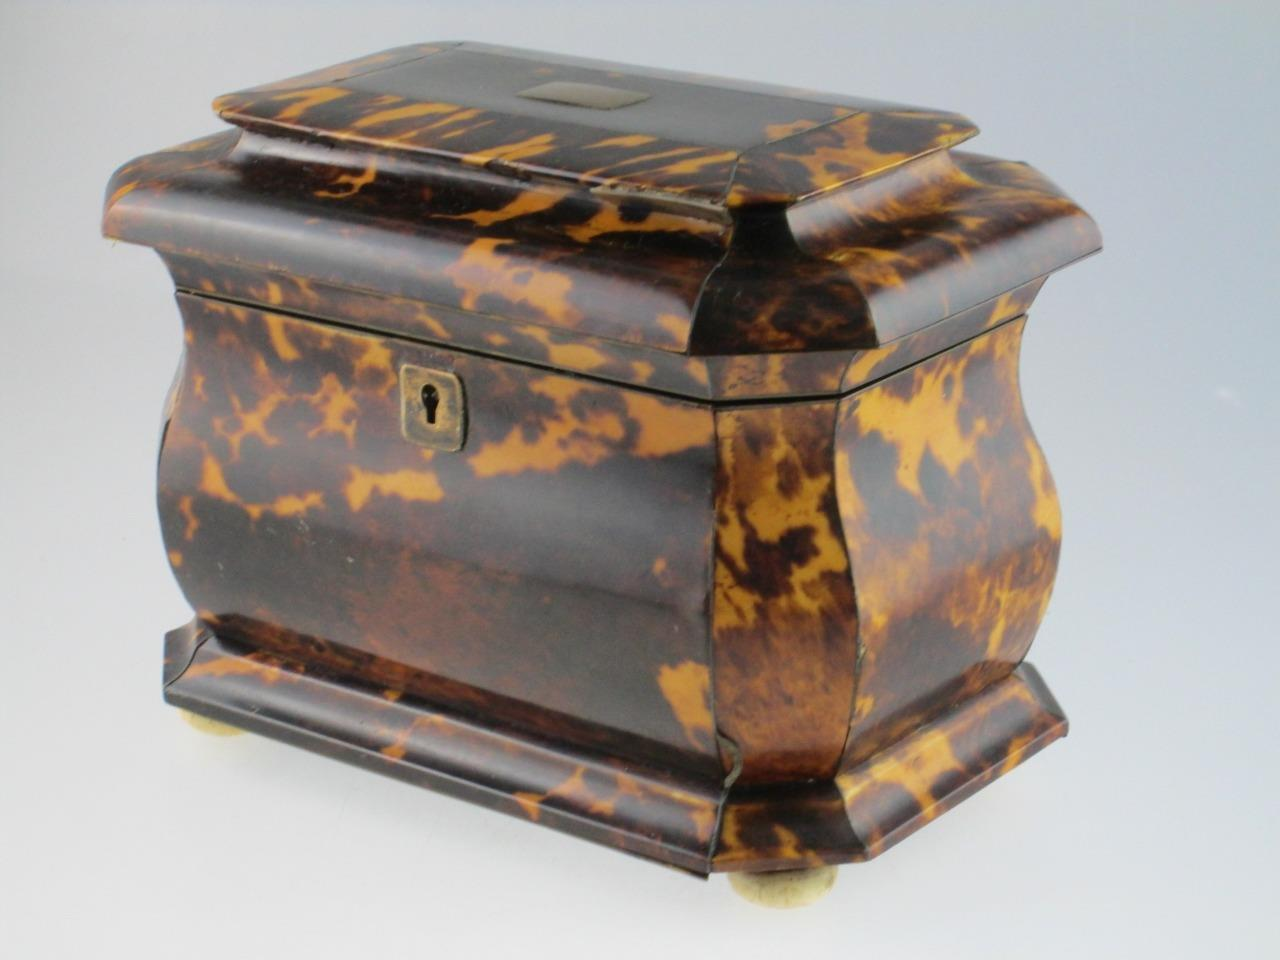 Tortoiseshell tea caddy - eBay.jpg